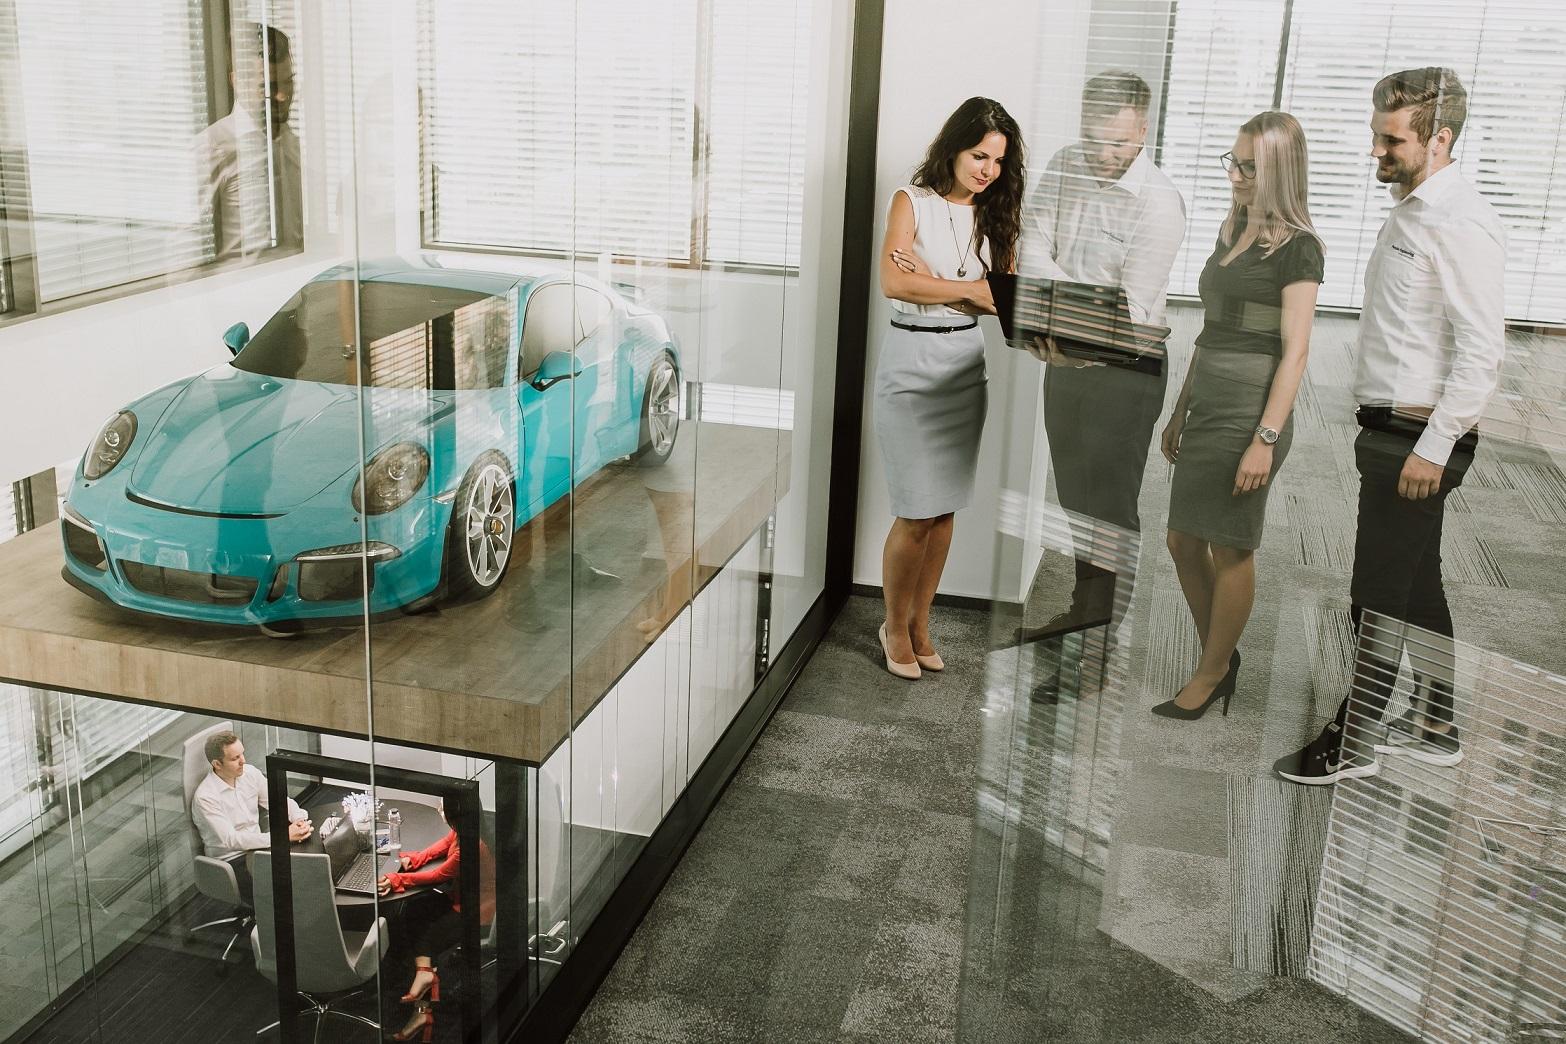 Porsche Engineering Romania intentioneaza ss isi mareasca numarul de angajati de la 120, la 200, in 2019